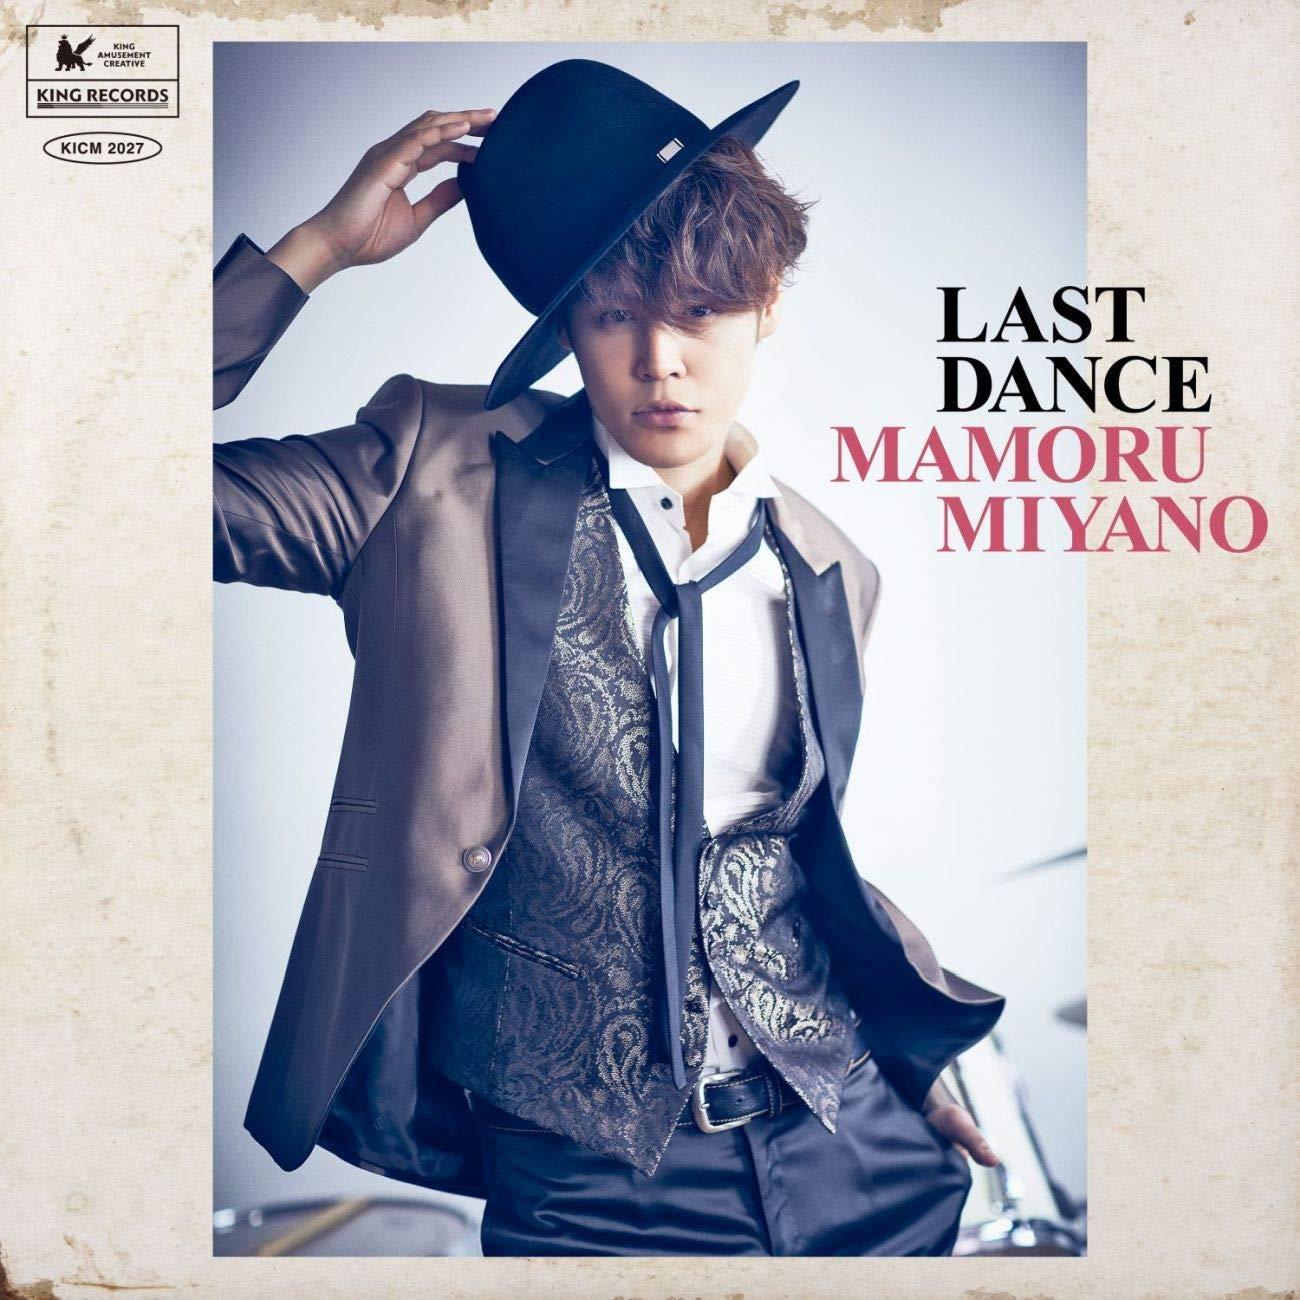 LAST DANCE – Mamoru Miyano